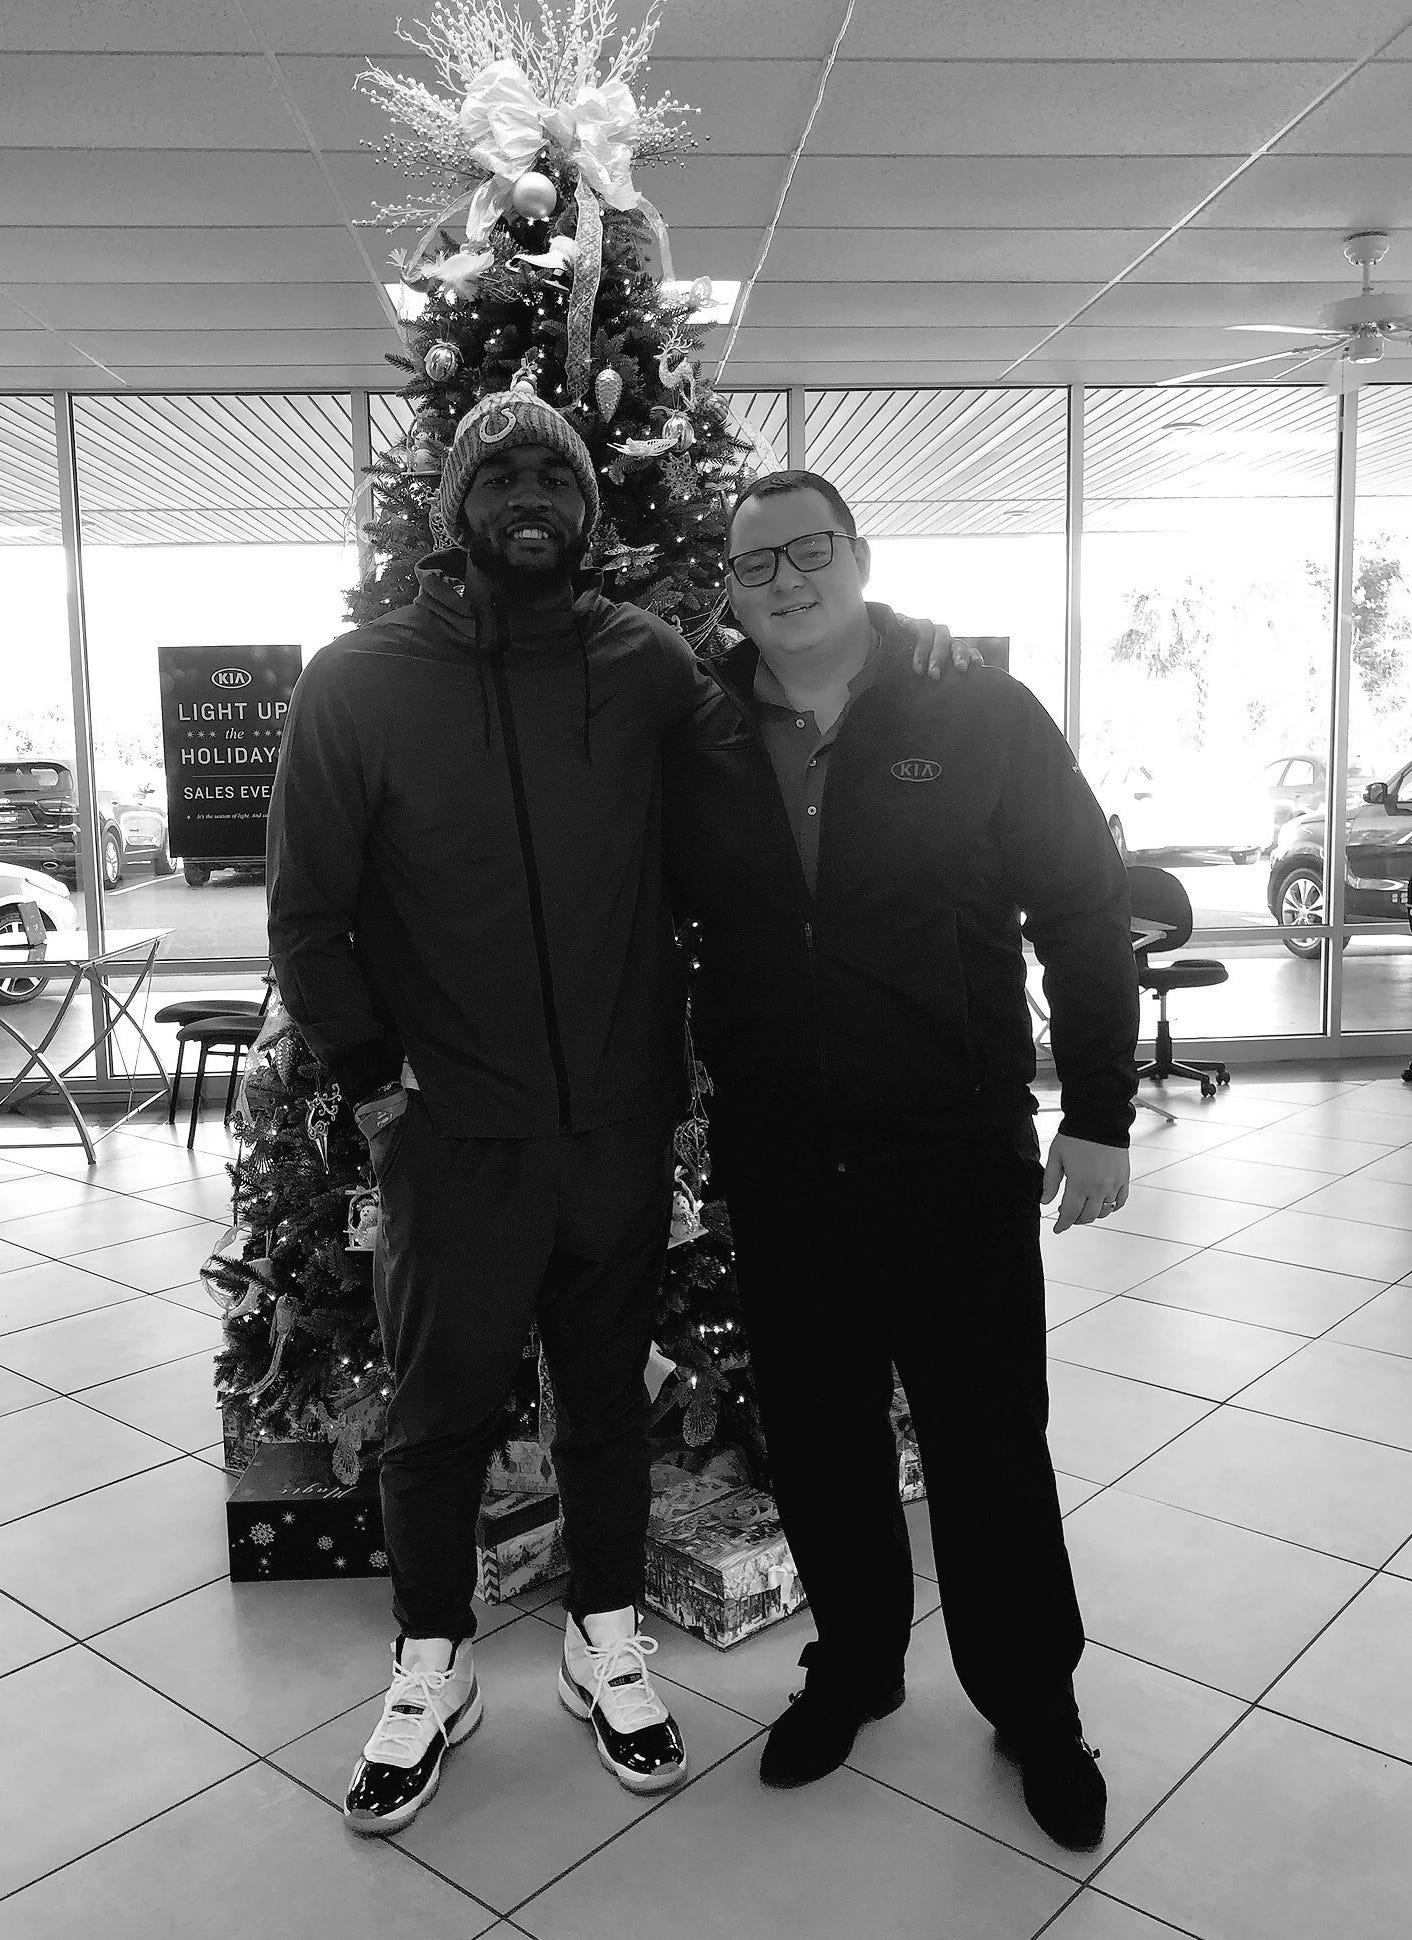 Darius Leonard surprised Colts fan and Indiana native Travis Fox at a Kia dealership in South Carolina on Monday.